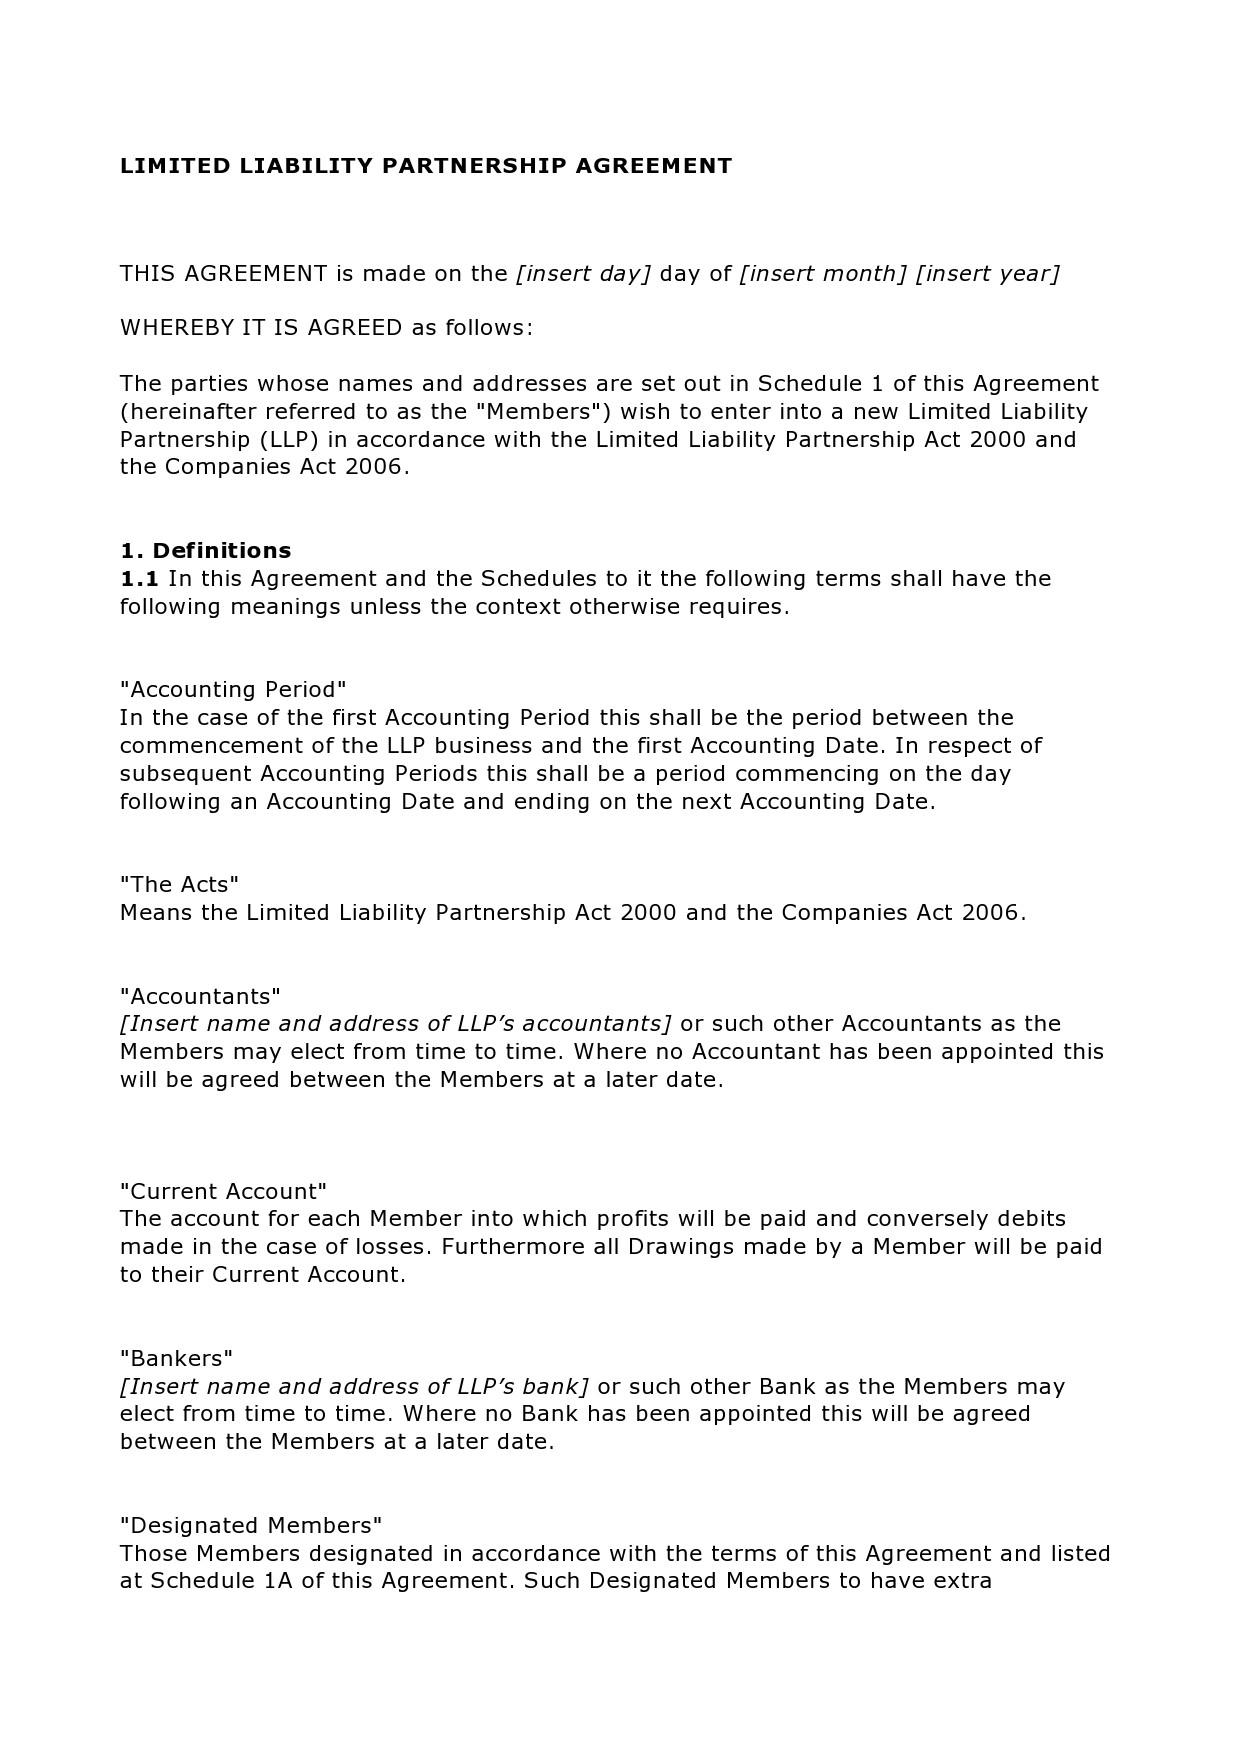 Free limited partnership agreement 18